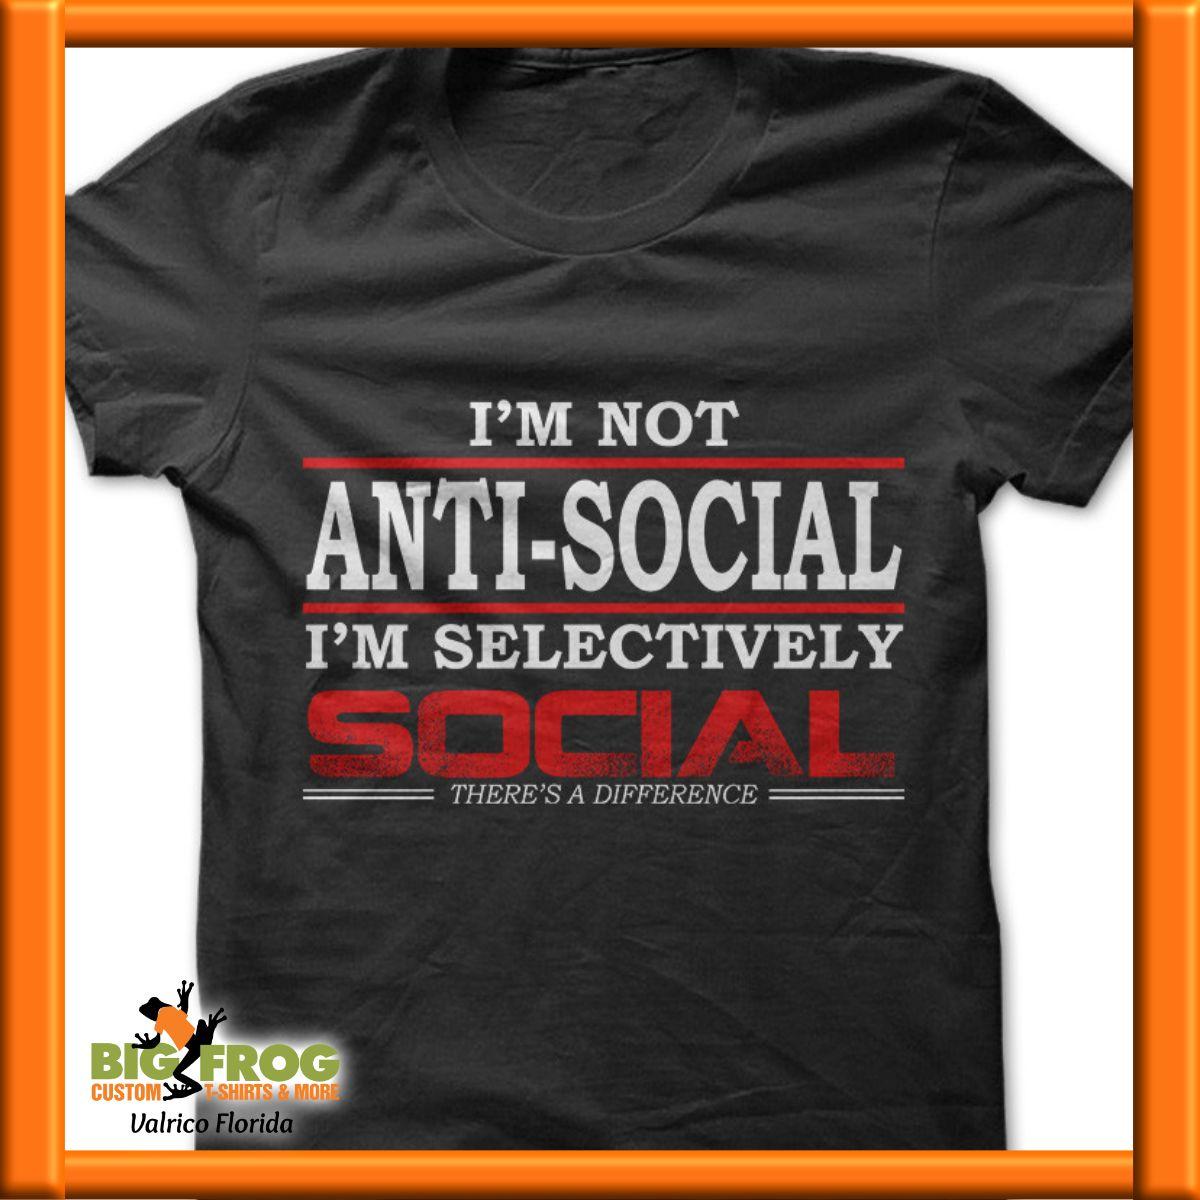 7d52d18d0 I'm not anti-social custom t-shirt. Get your custom graphic